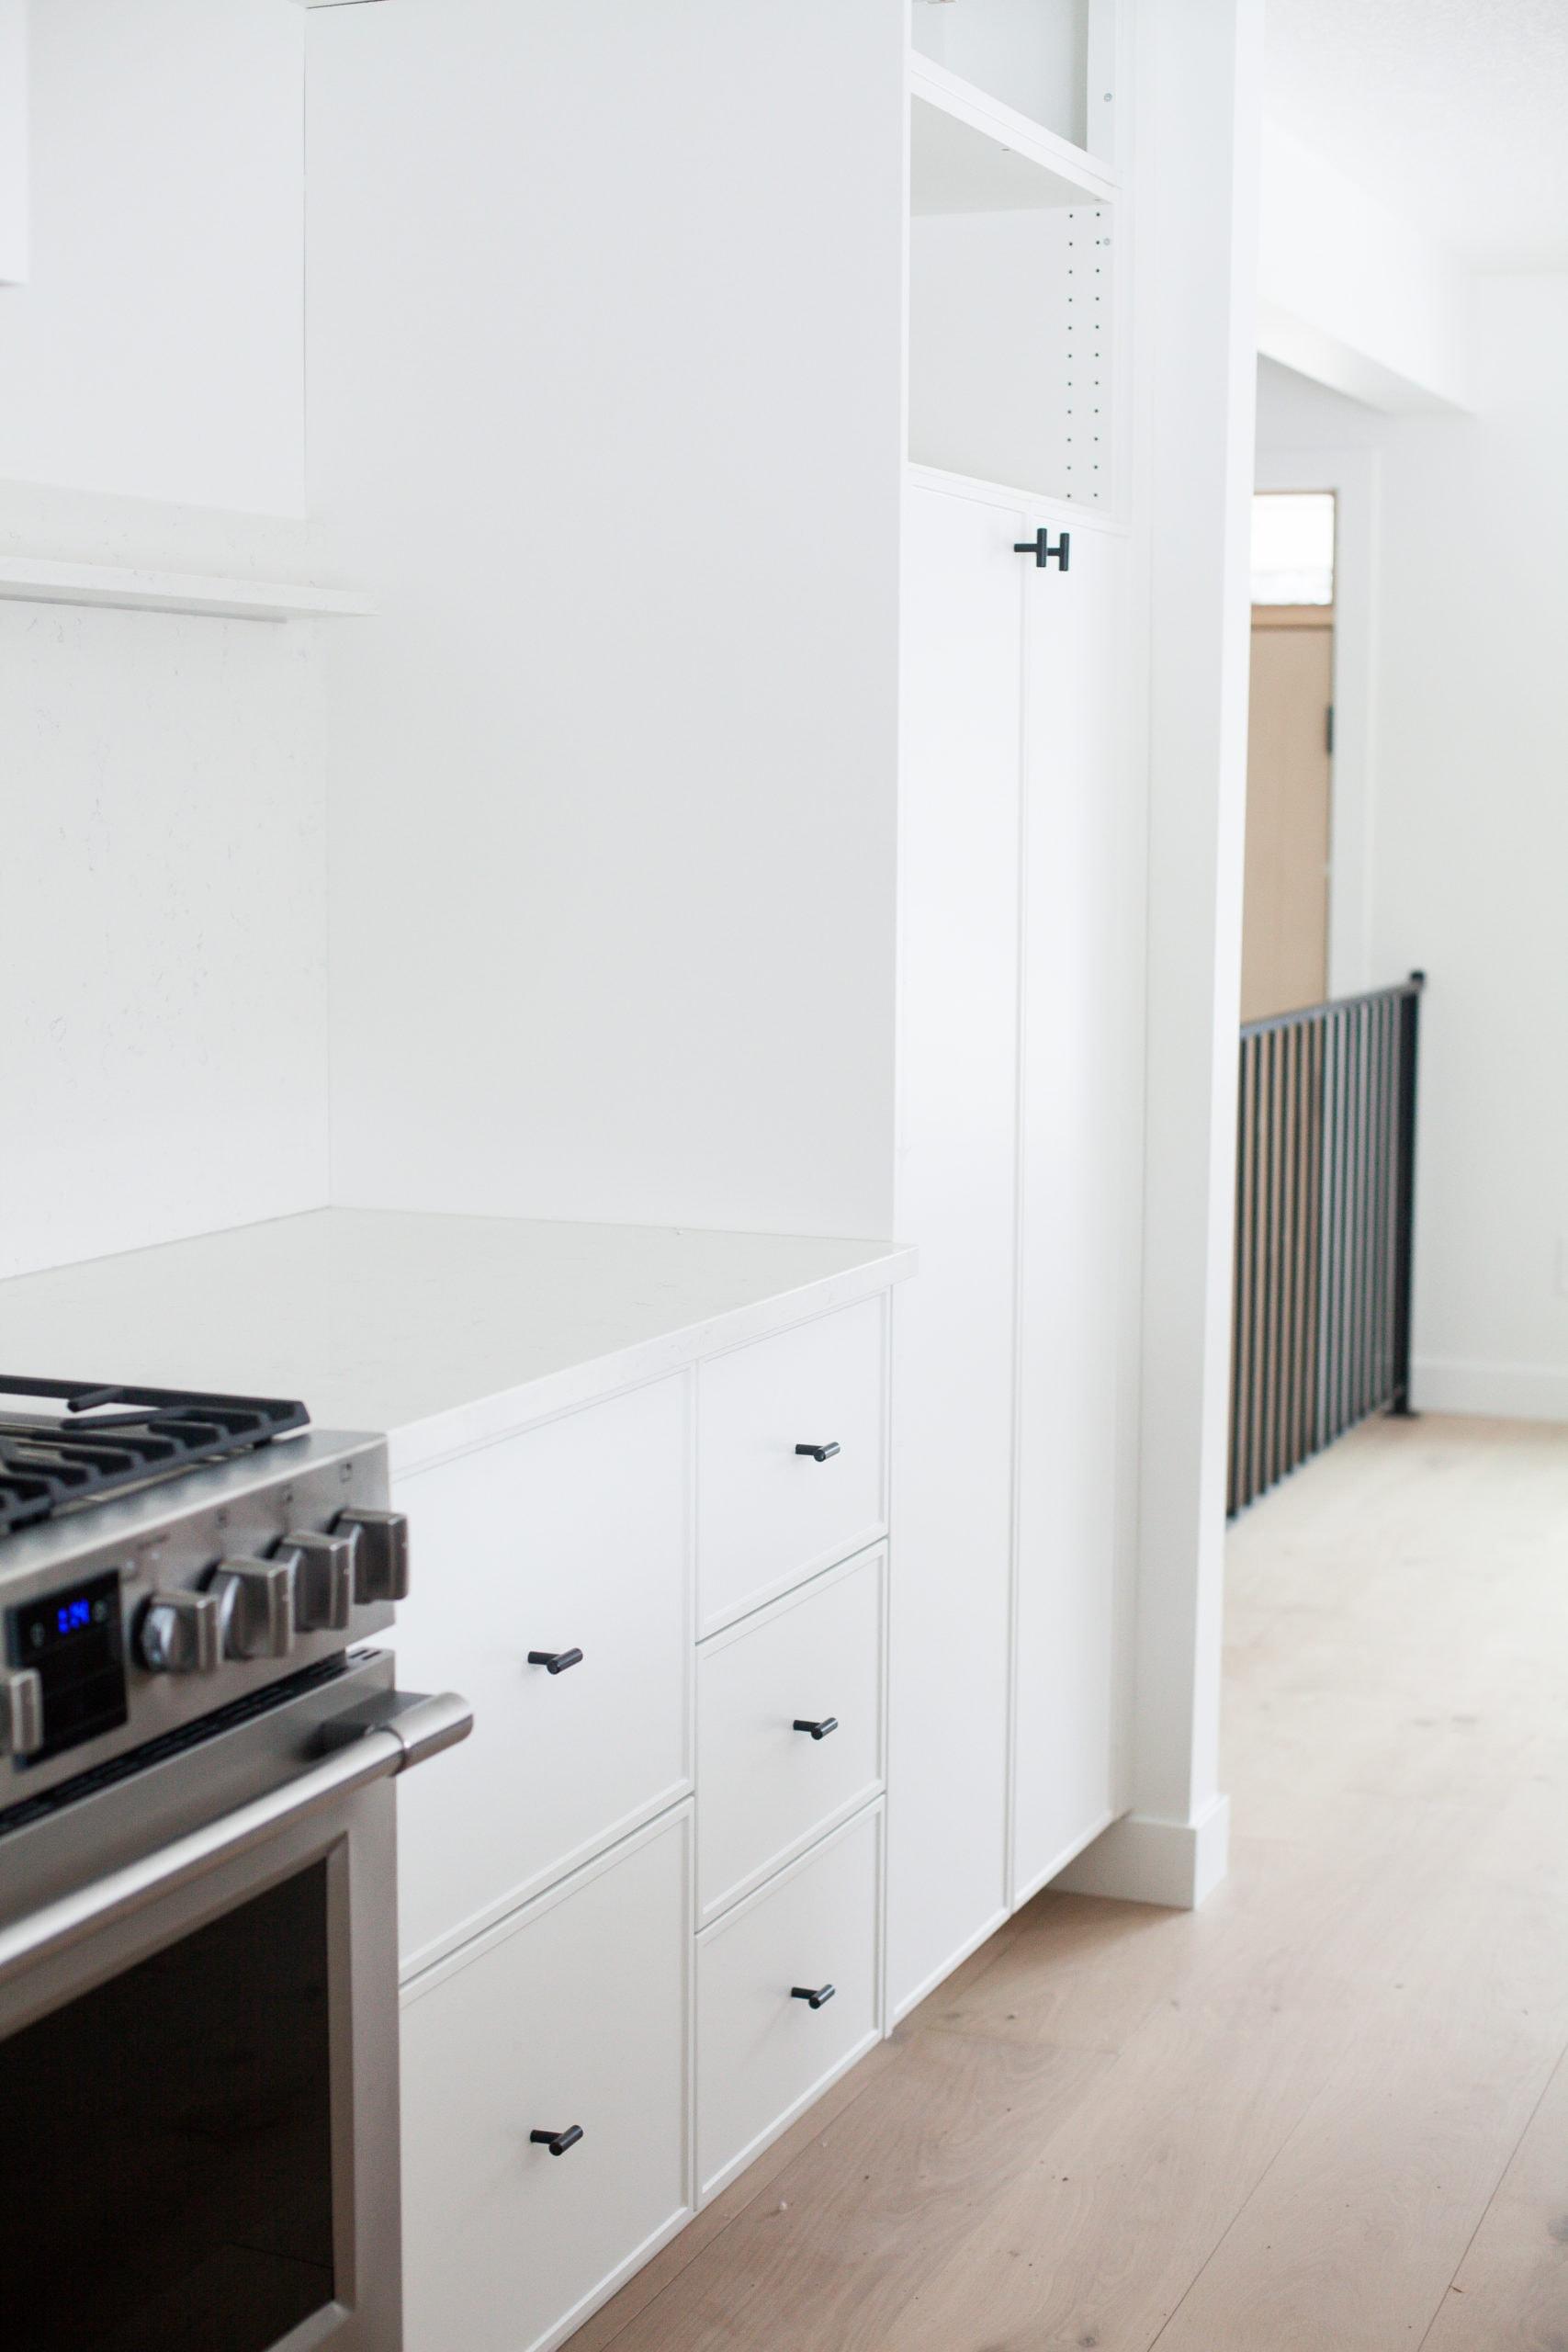 Full Home Renovation - Earthy Coastal Scandinavian California Minimal Kitchen Remodel